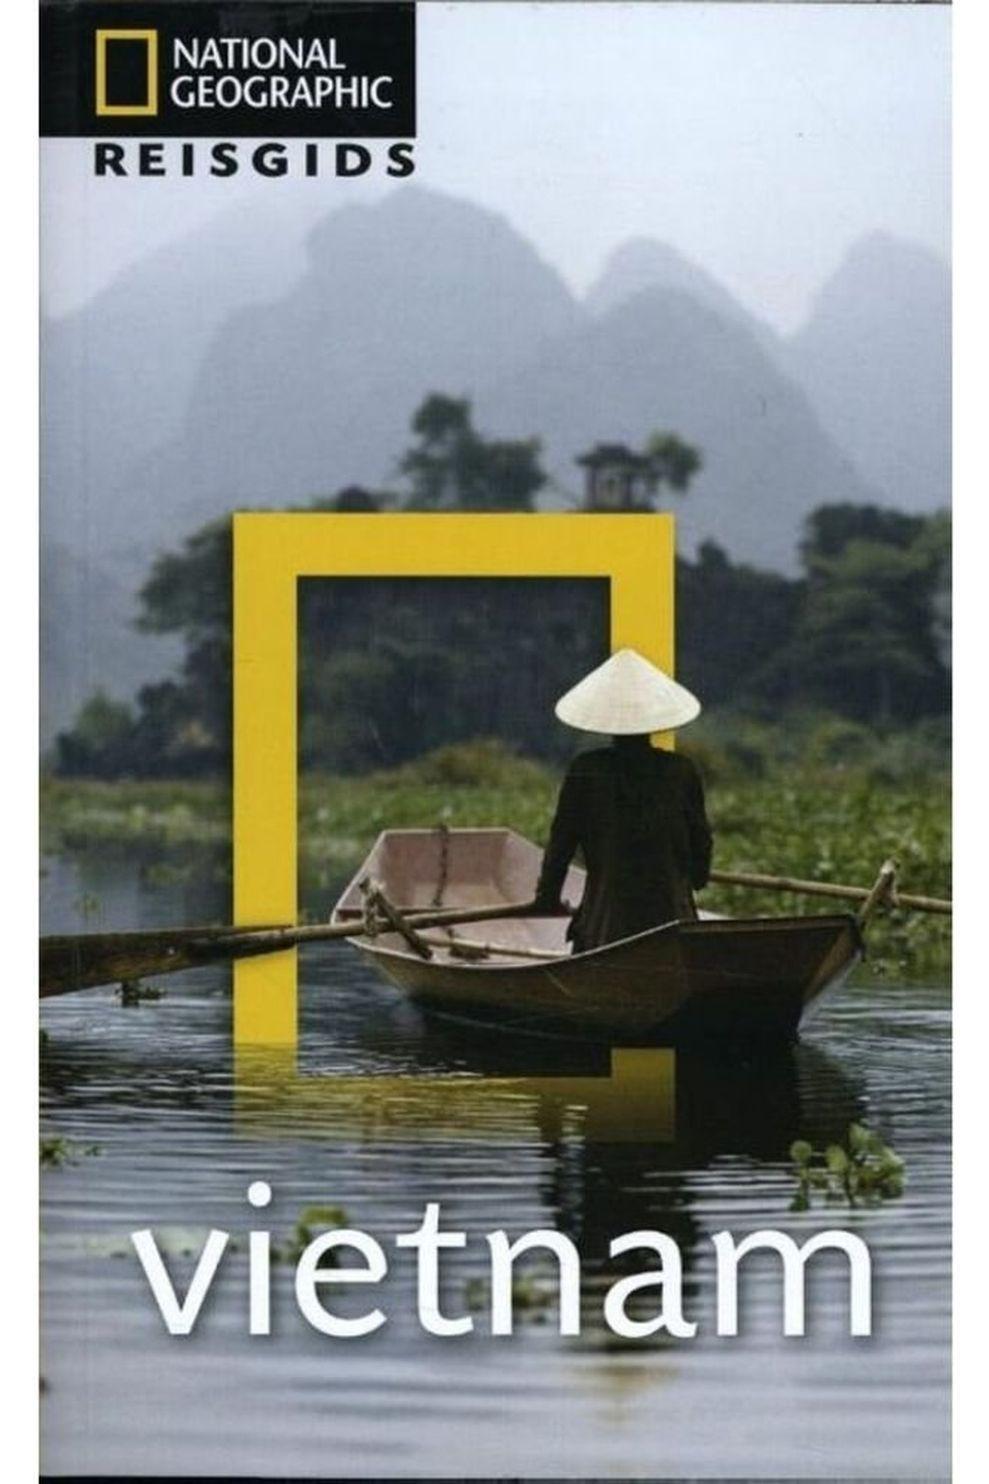 National Geographic Vietnam-Reisgids-Nat.Geographic-N04/2018 - 2019